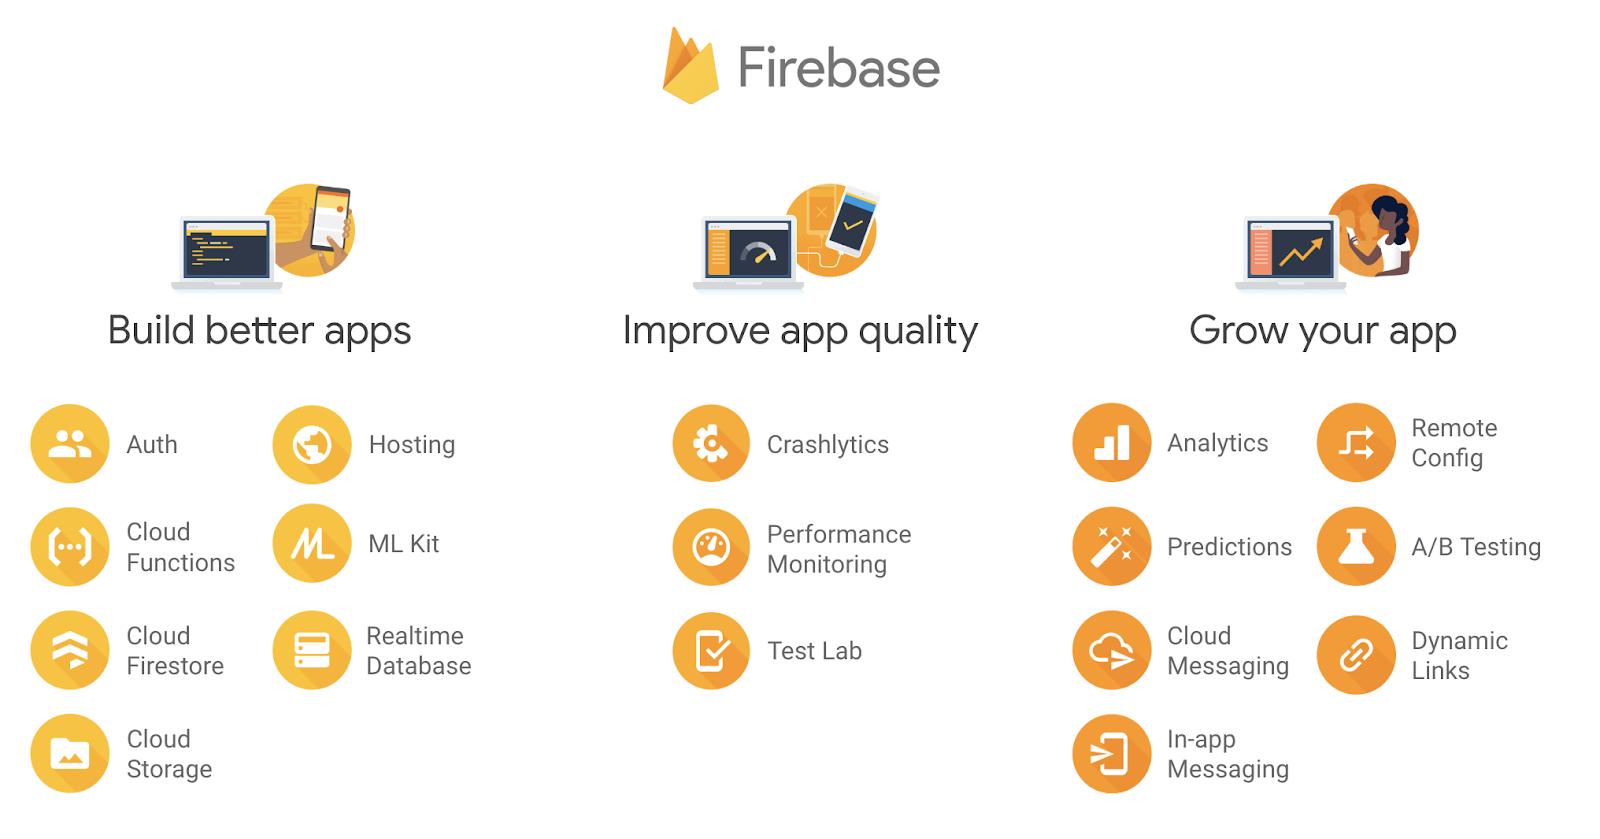 Firebase misconfiguration